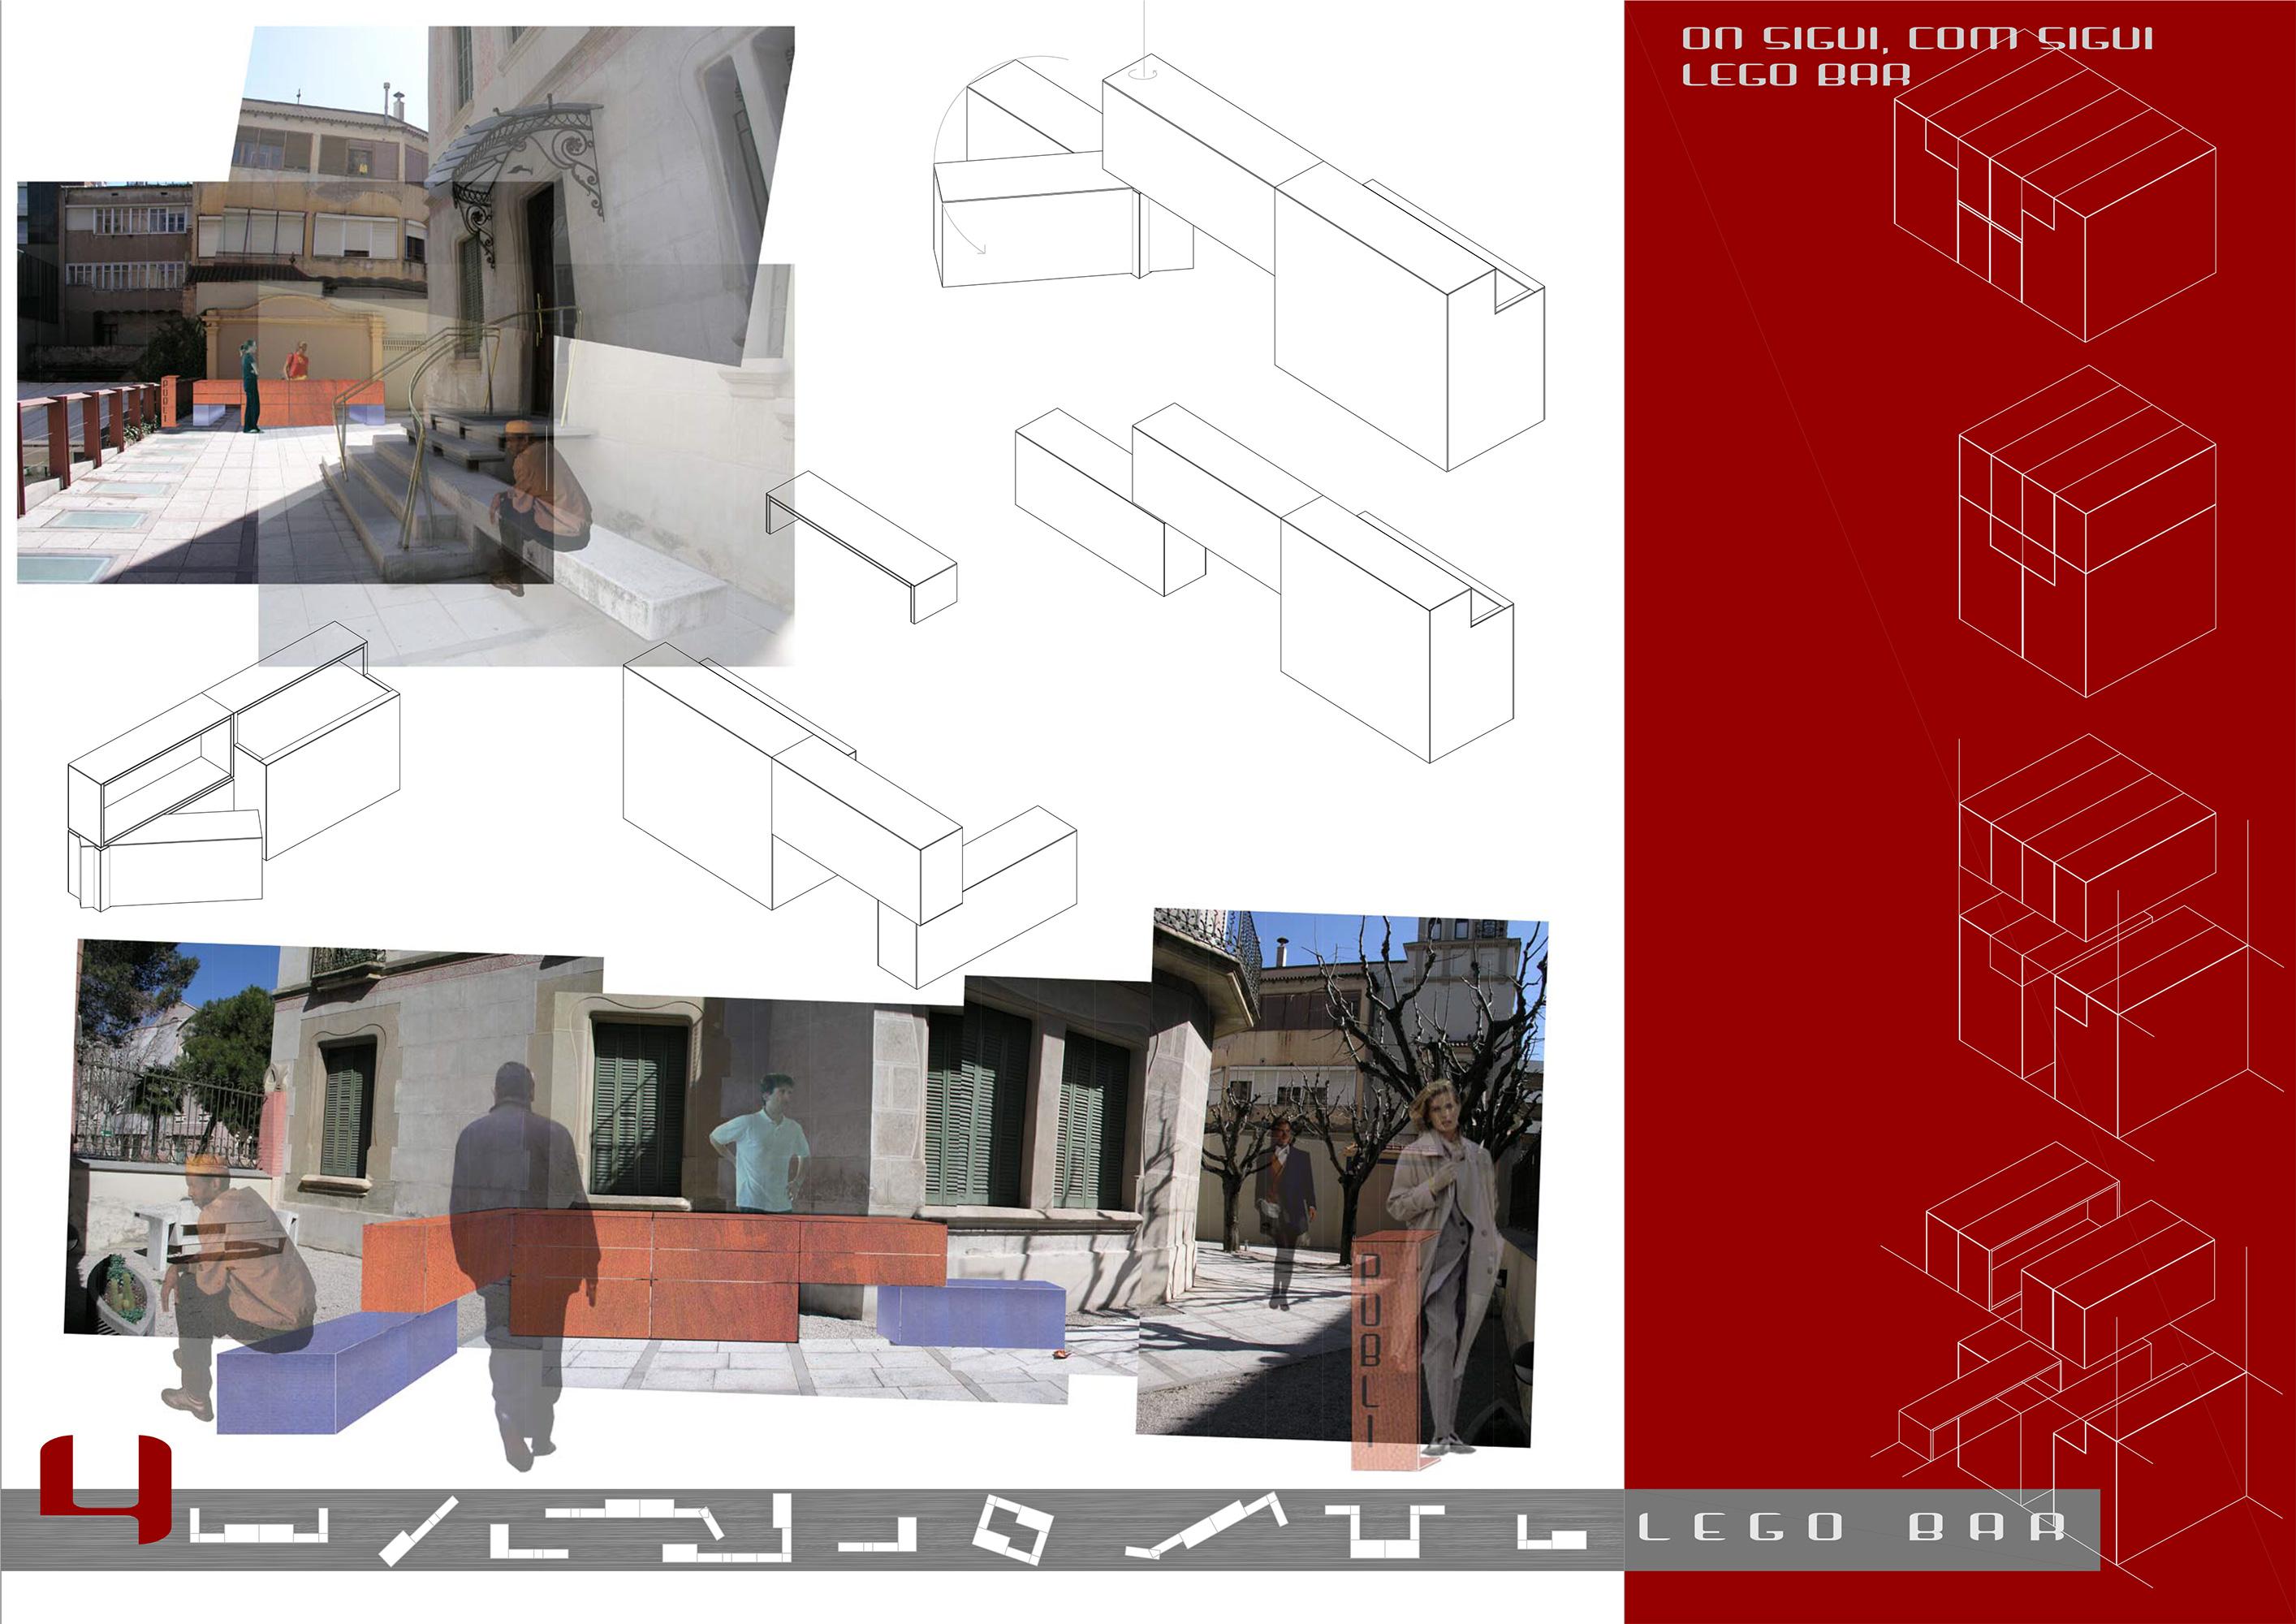 http://www.oa-arquitectes.com/wp-content/uploads/2018/05/04-4.jpg